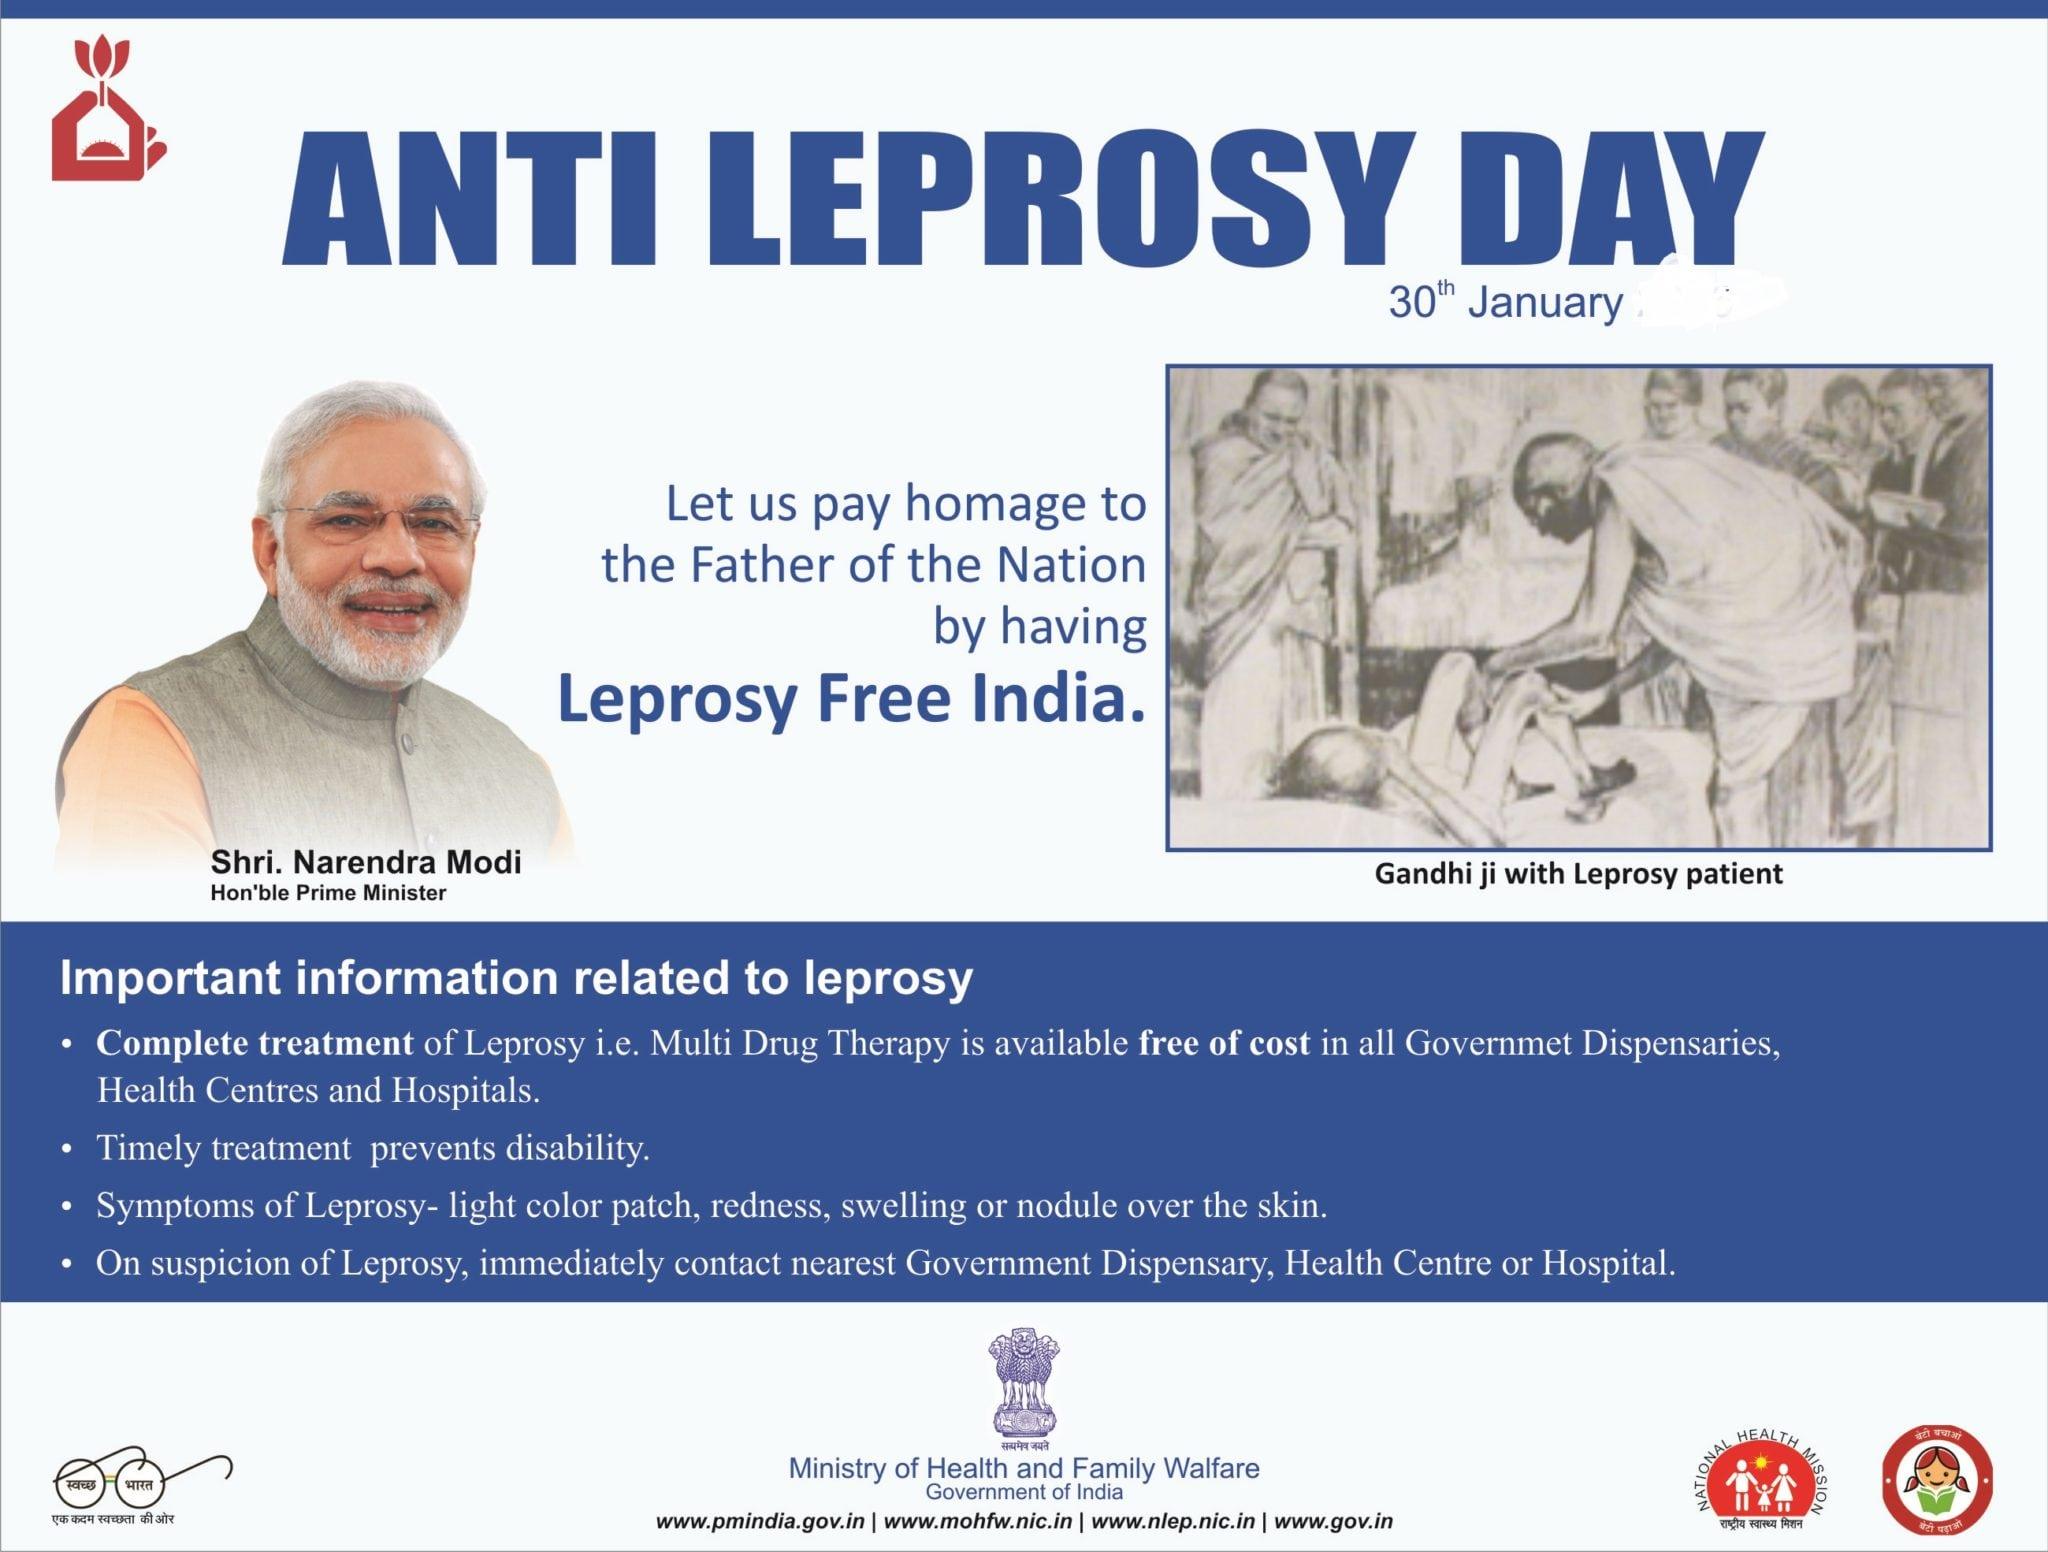 Anti Leprosy Day